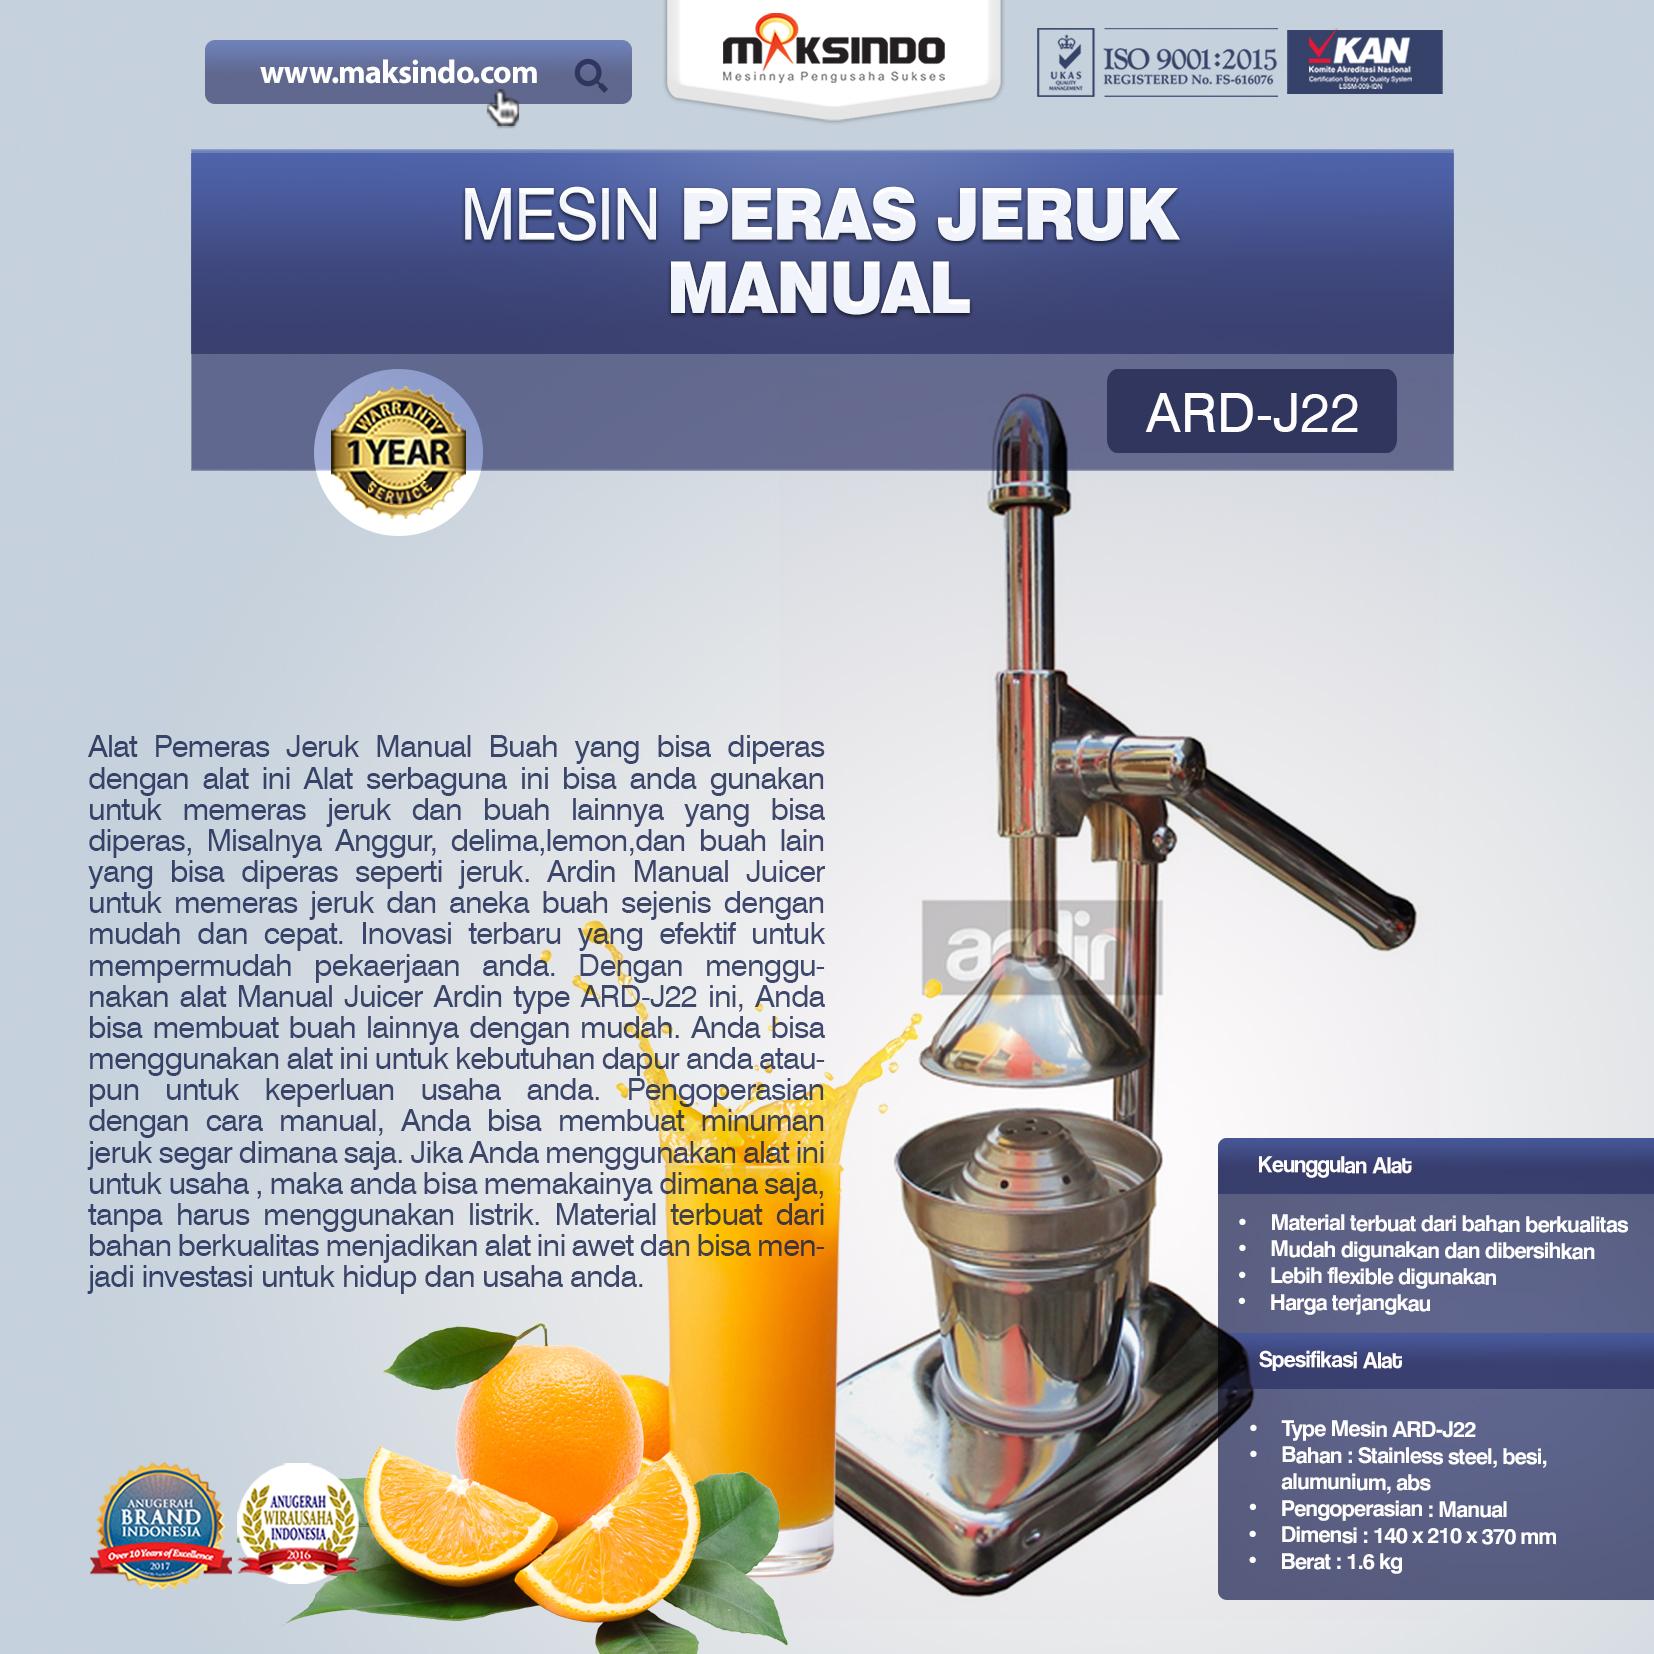 Jual Alat Pemeras Jeruk Manual ARD-J22 Di Banjarmasin